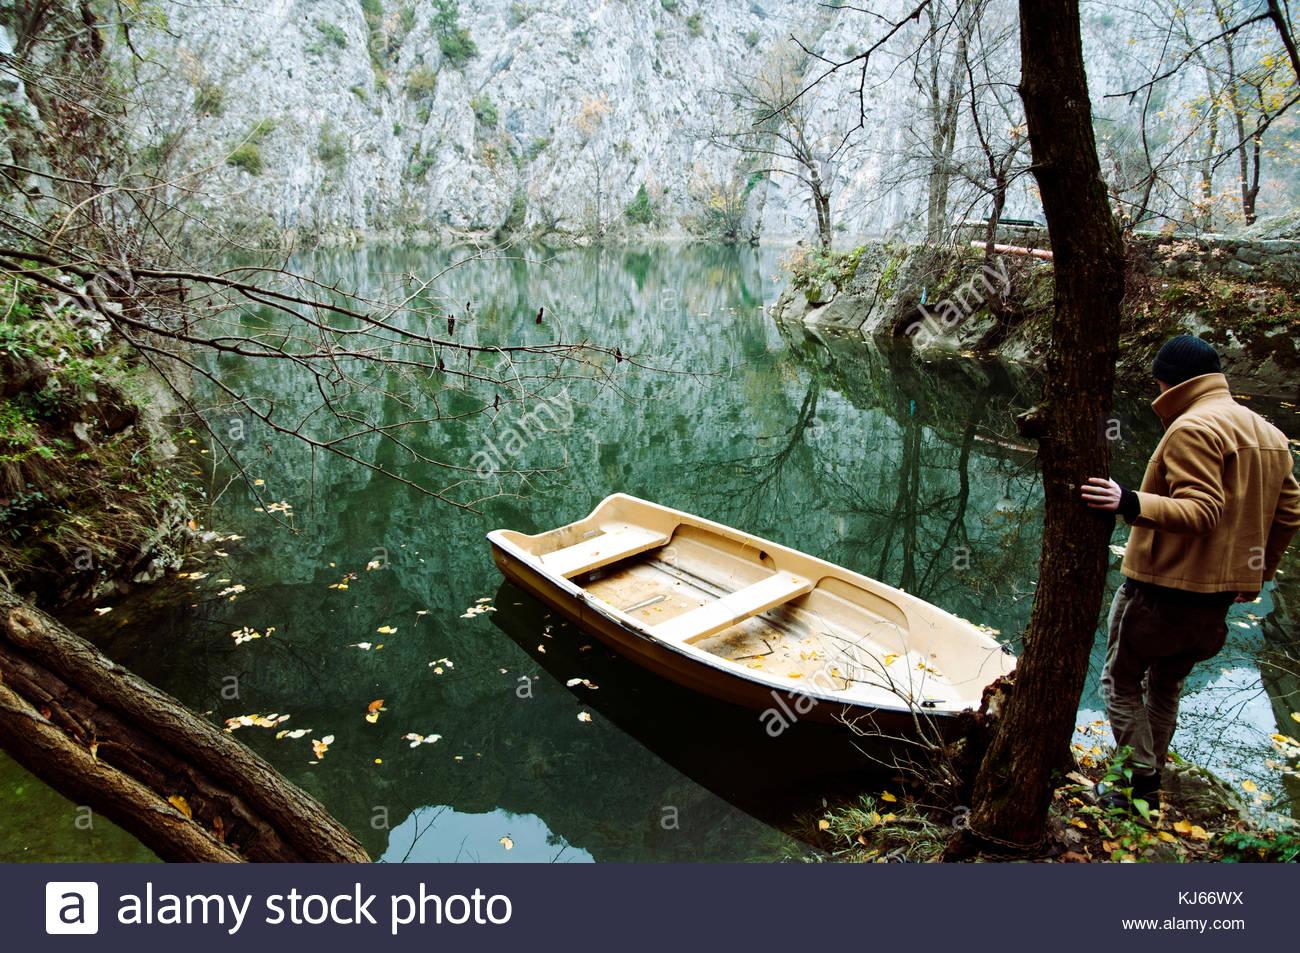 Joven acercándose a un pequeño bote a remo Imagen De Stock